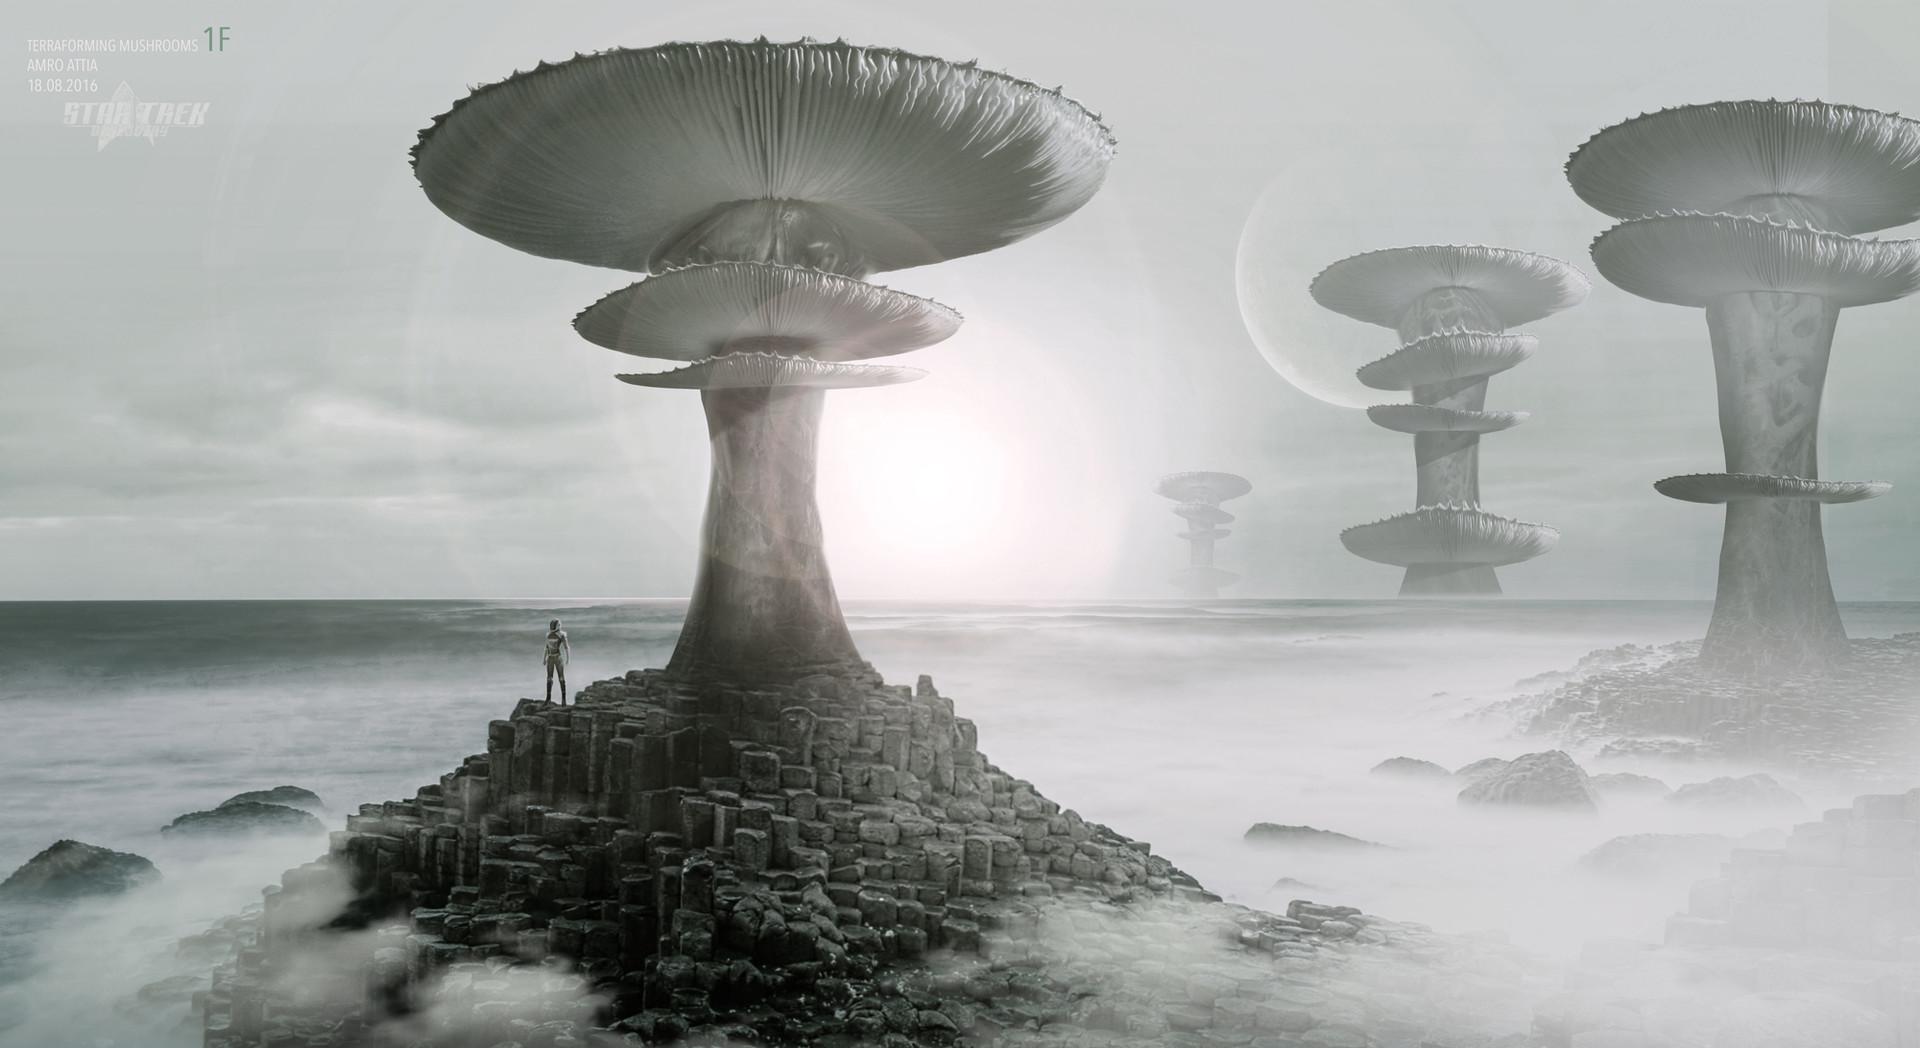 Amro attia terraforming mushrooms1f